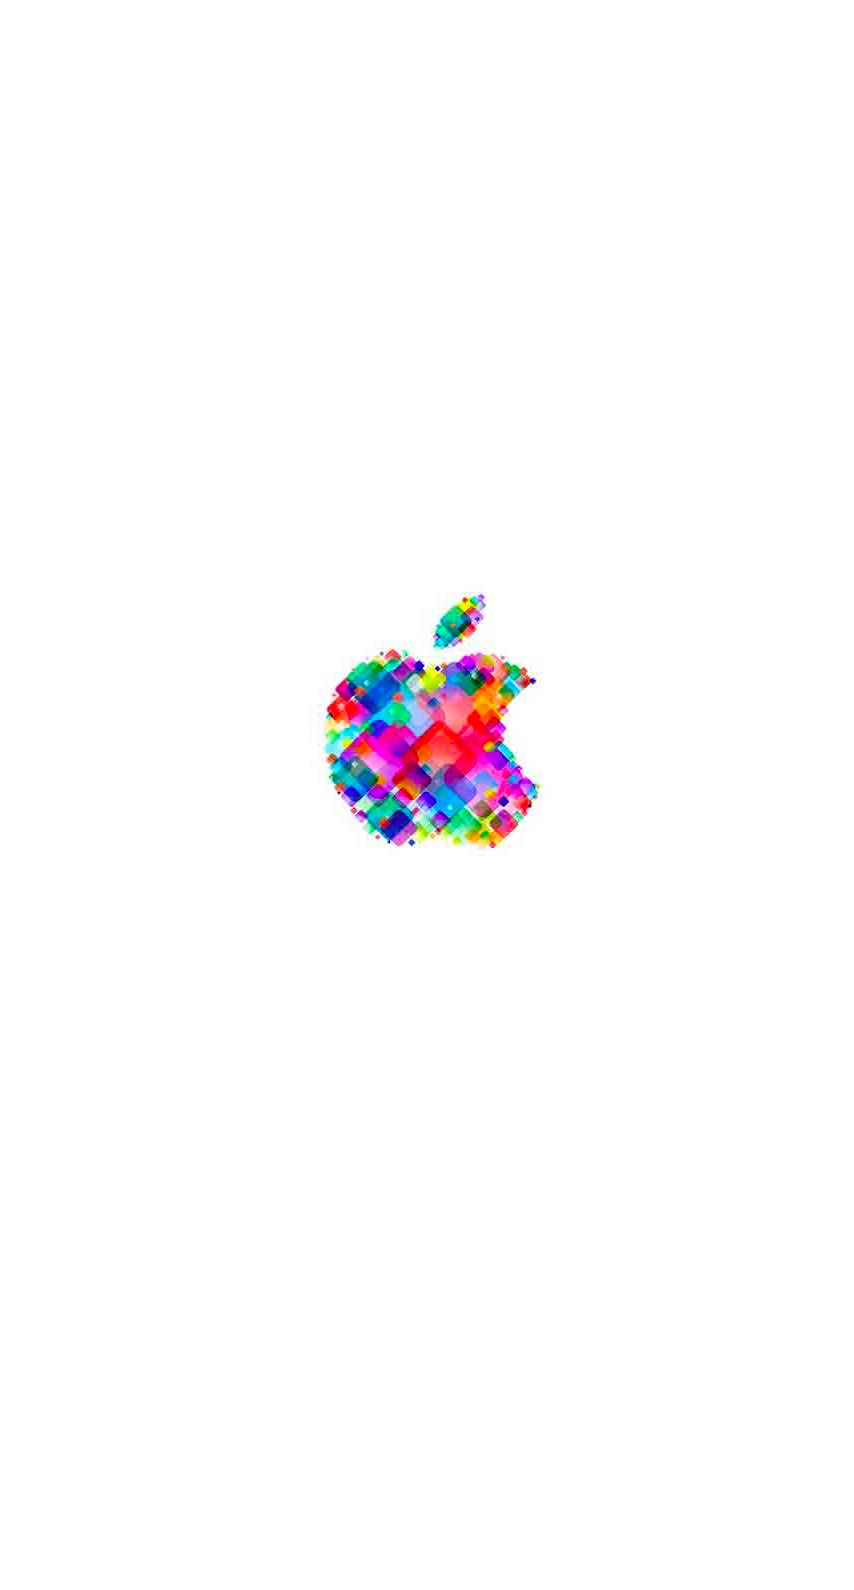 Appleロゴポップカラフル白 Wallpaper Sc Iphone6s壁紙